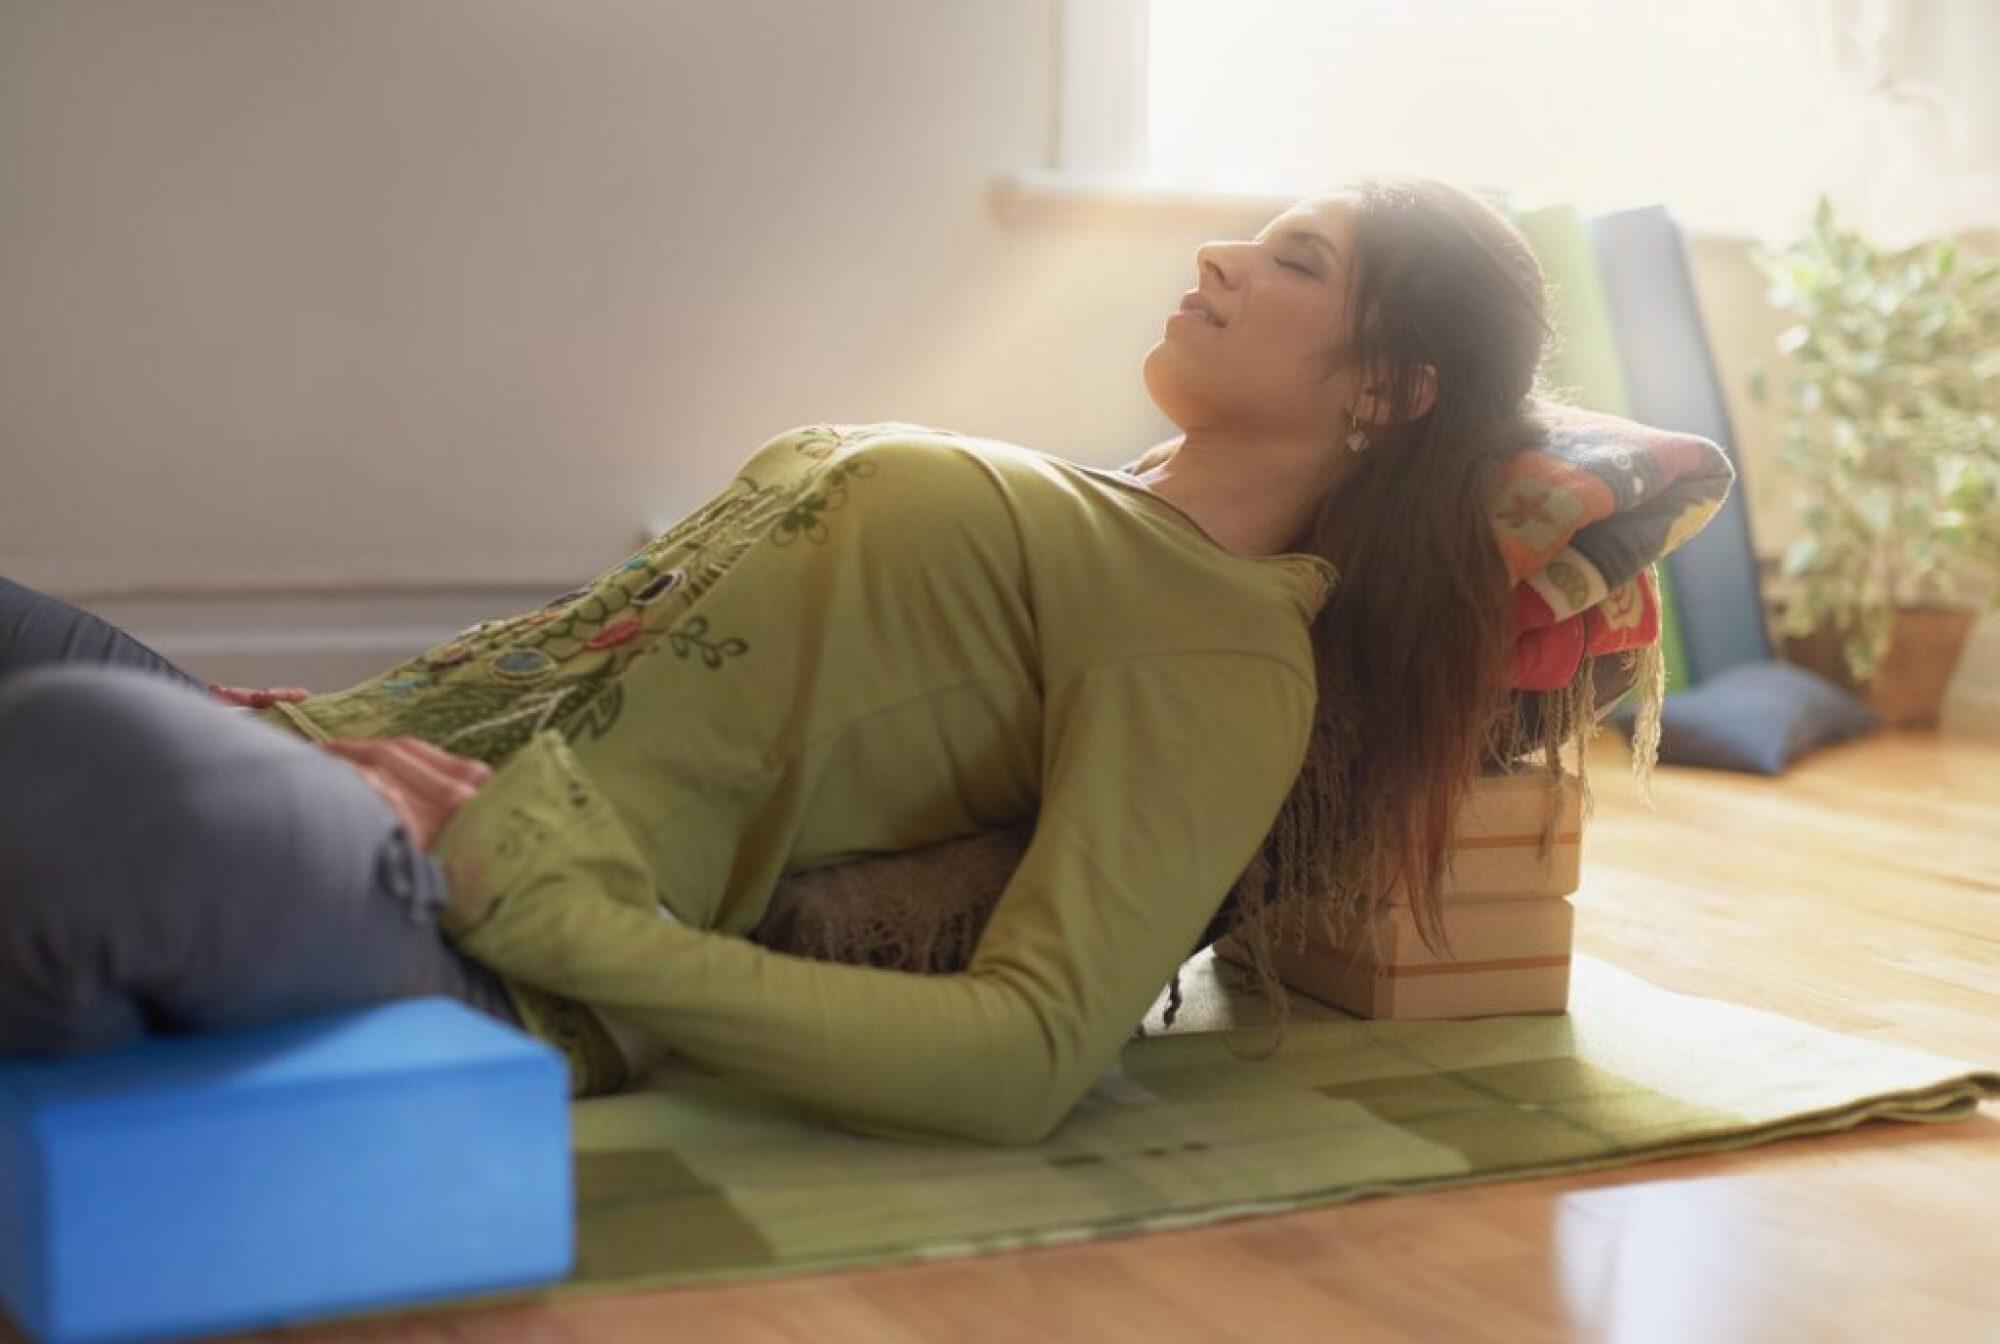 restorative yoga hardest workout